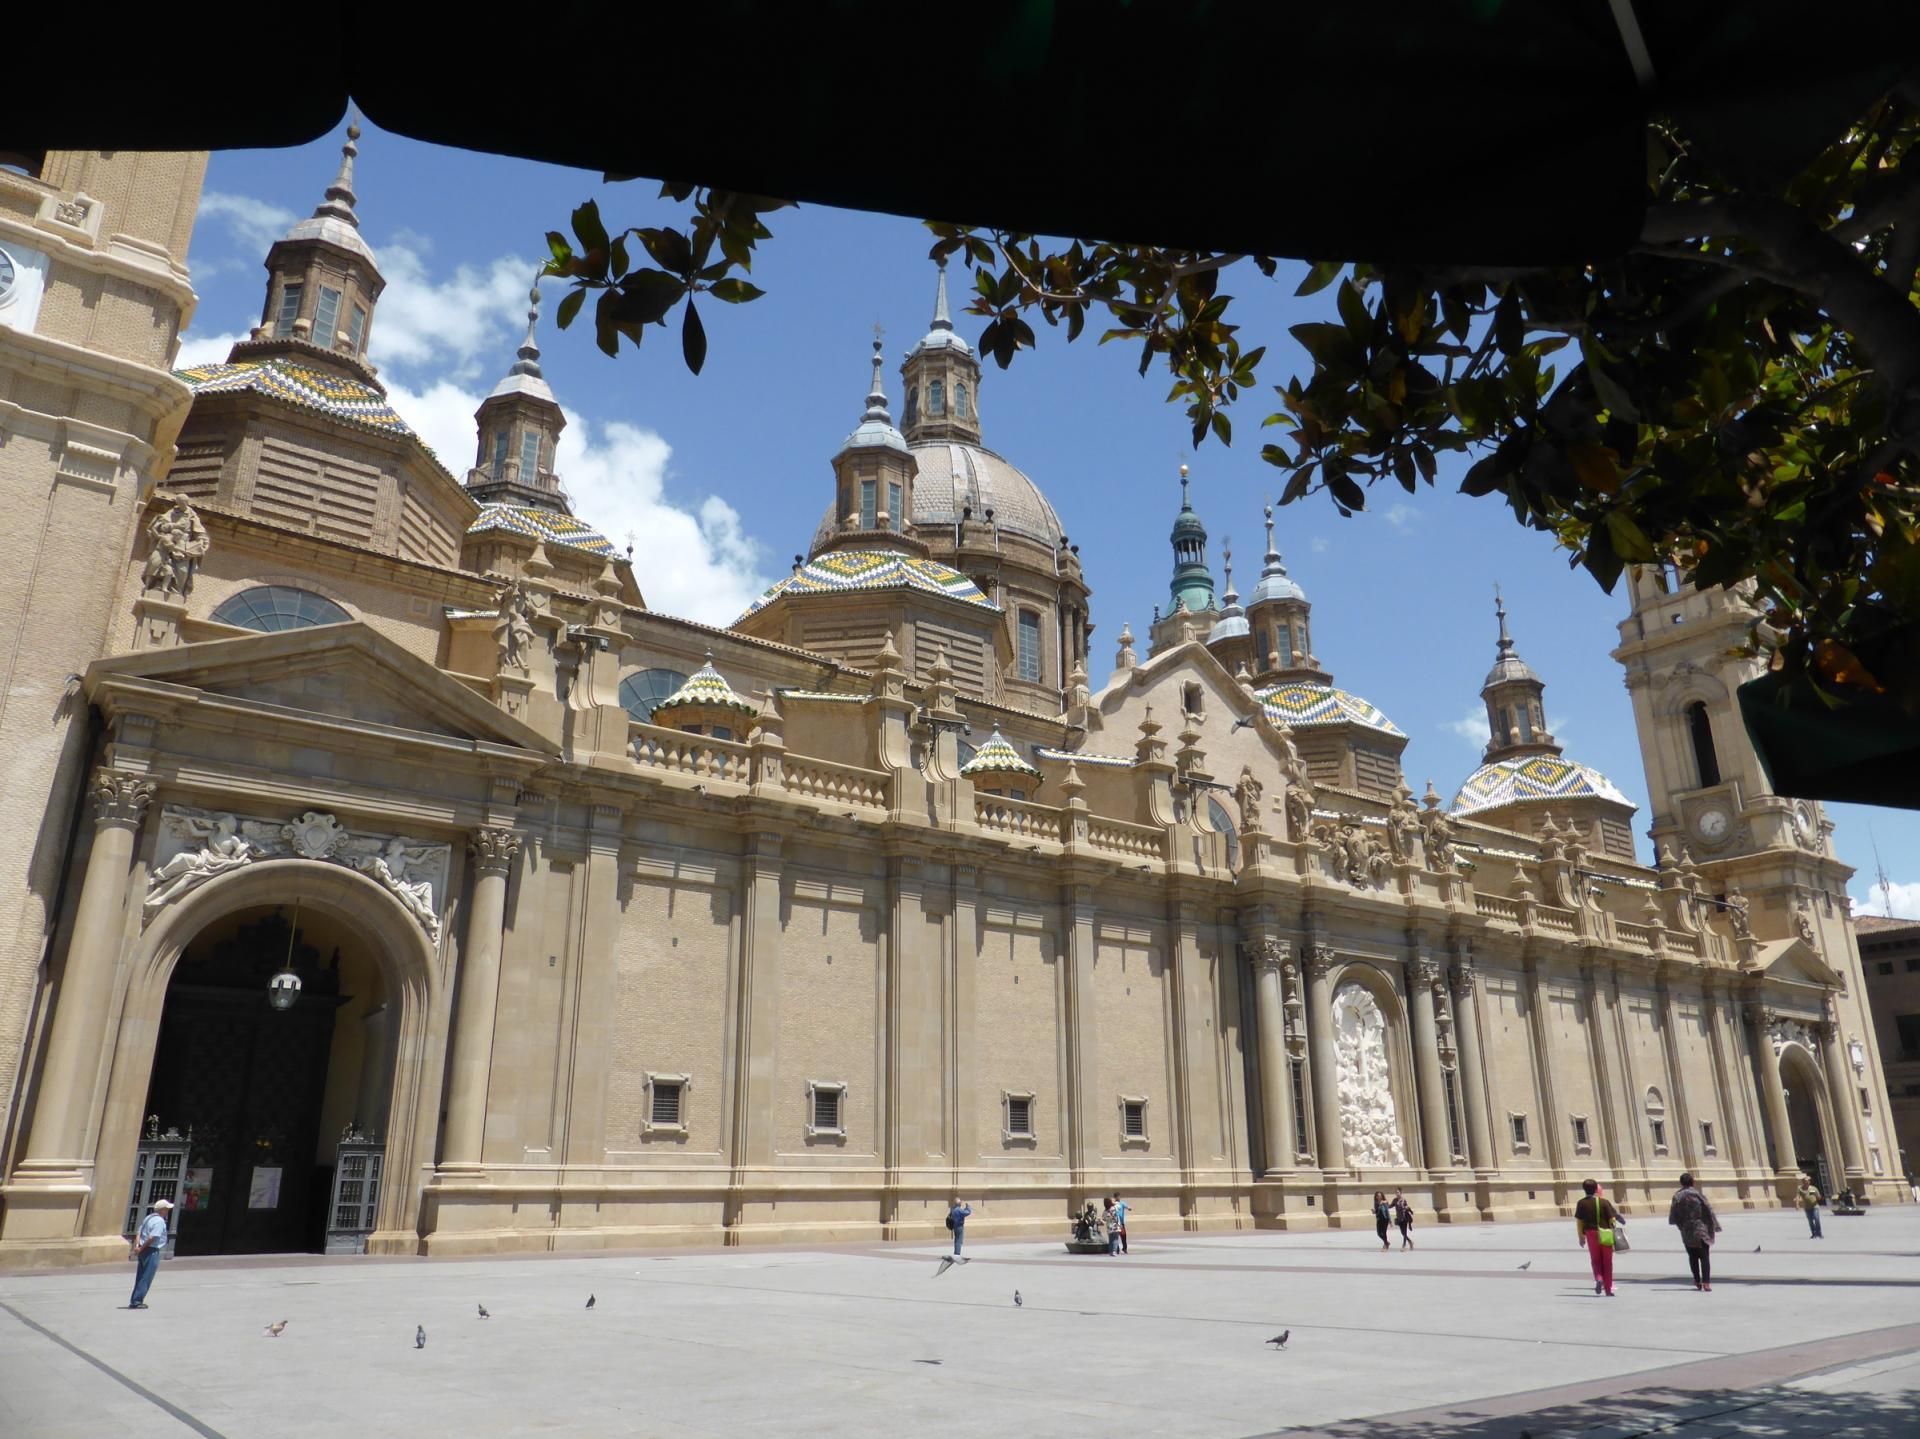 Saragosse, Nuestra Senora del Pilar, façade, XVIIIe siècle, cl. Ph. Cachau